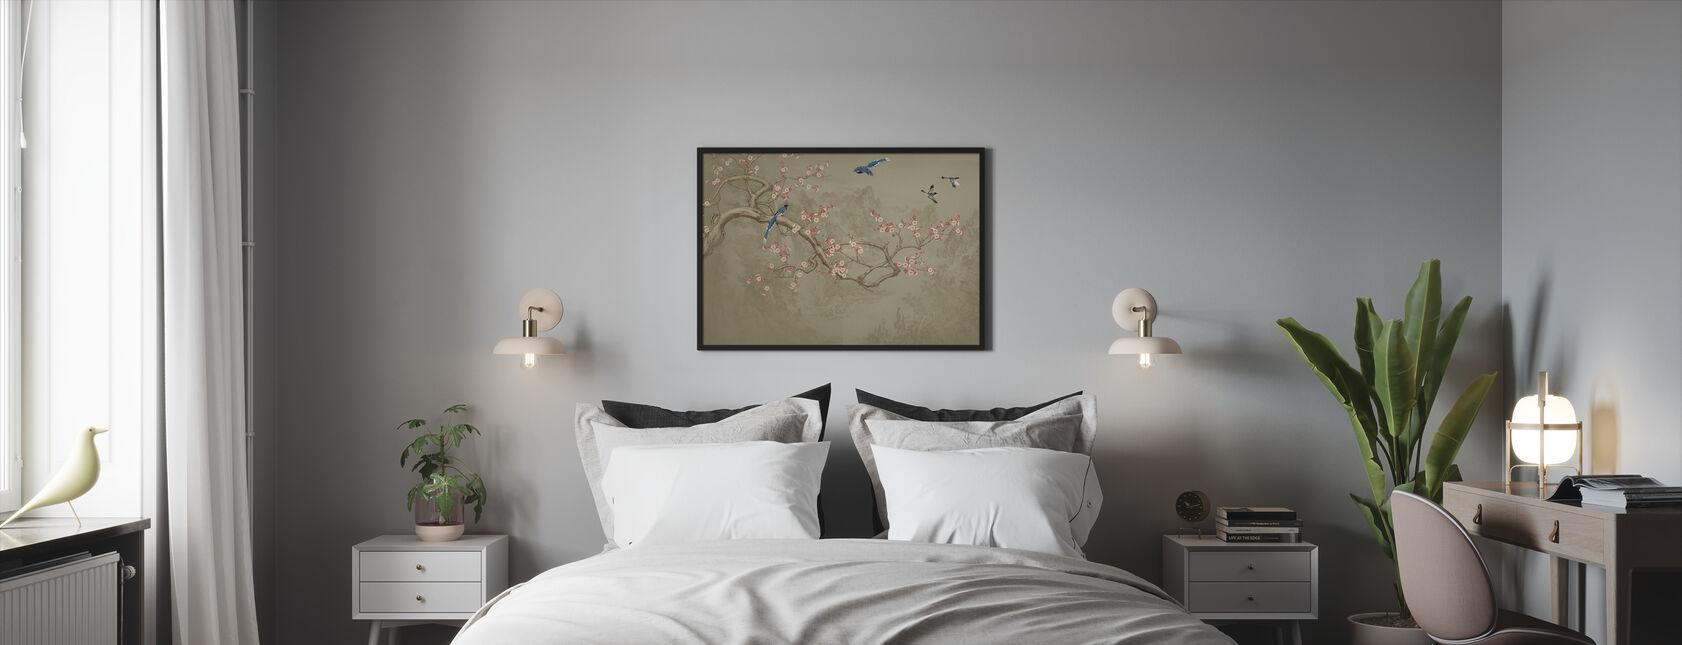 Birds heights - Cocoa - Framed print - Bedroom